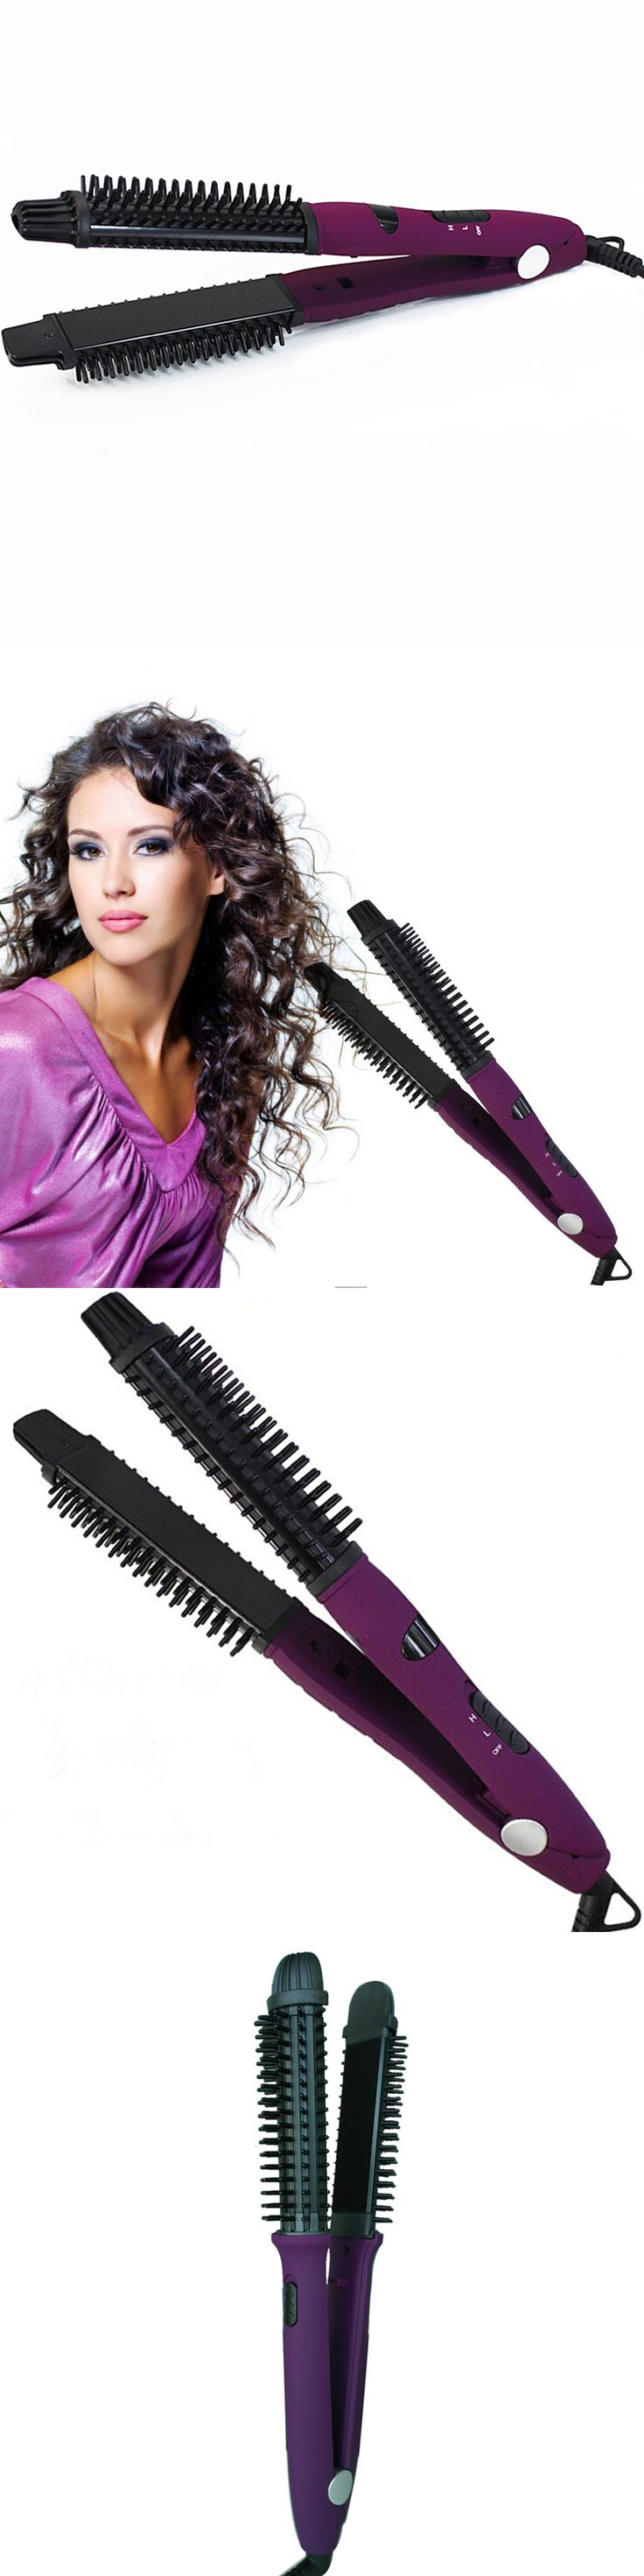 CamryBeauty 5 IN 1 Ceramic Hair Straightener Comb  Hair Styler/Curler  Hot Brush and Ceramic Flat Iron/Straightener